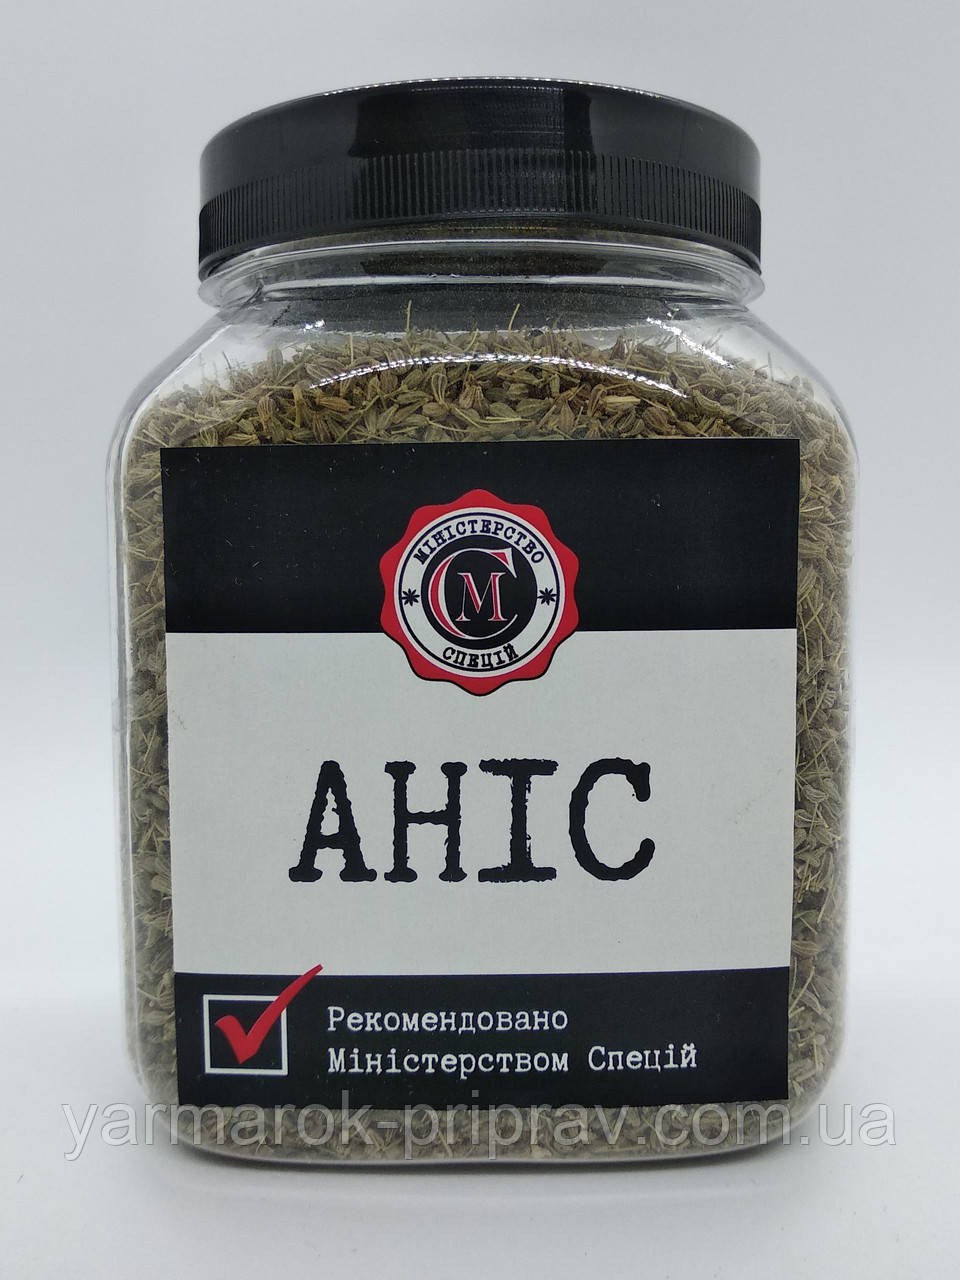 Анис семена, 170г